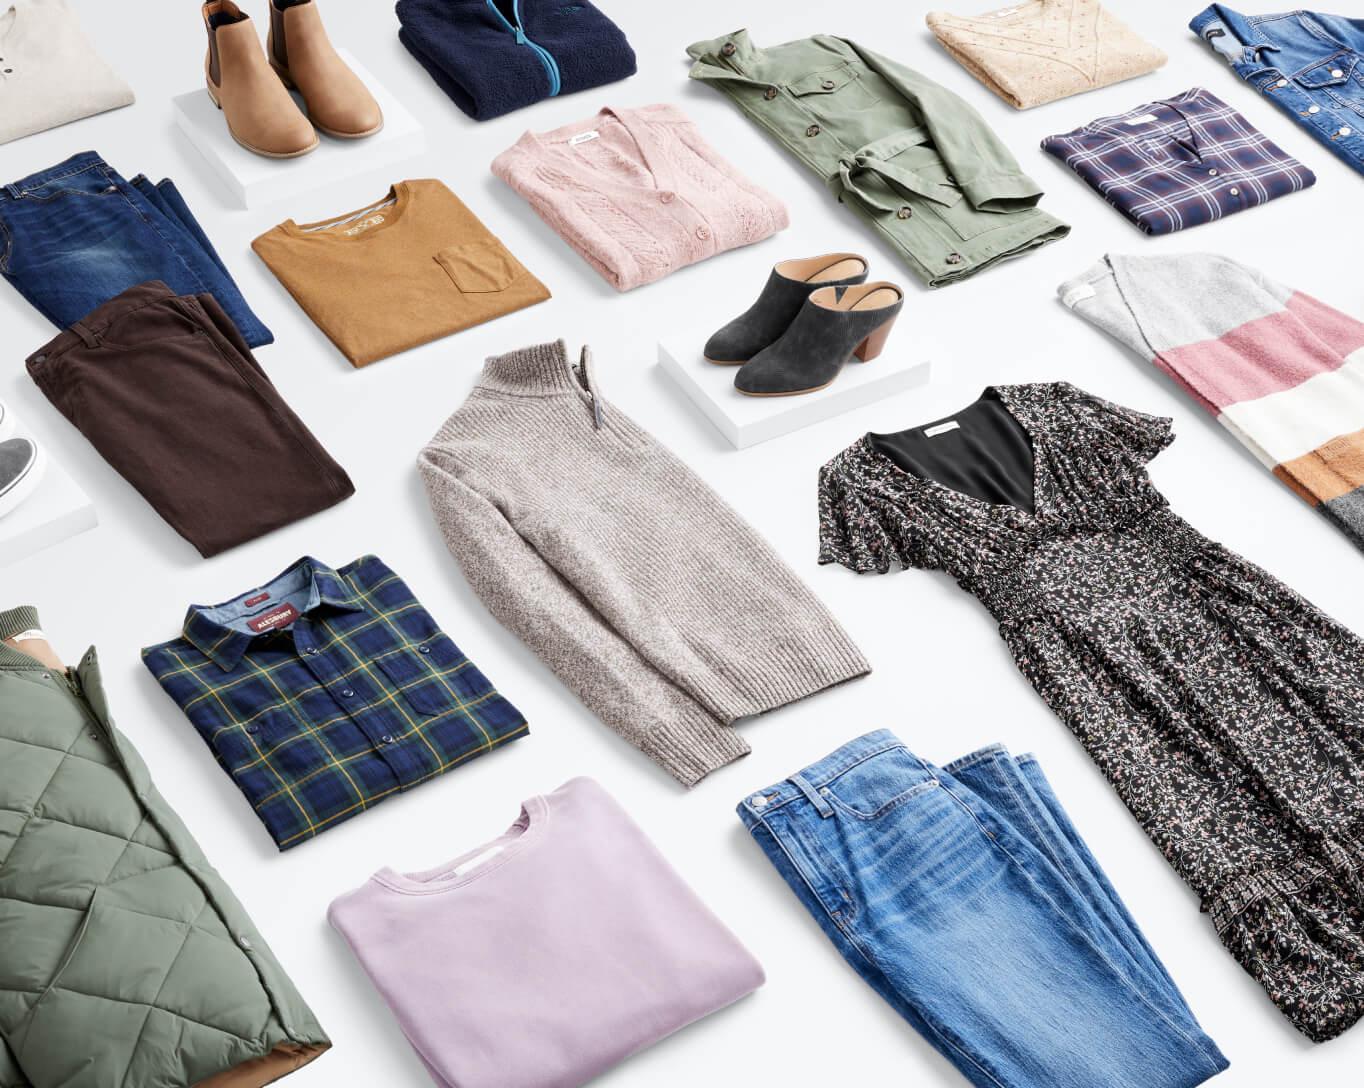 Stitch Fix men's and women's clothing assortment folded.